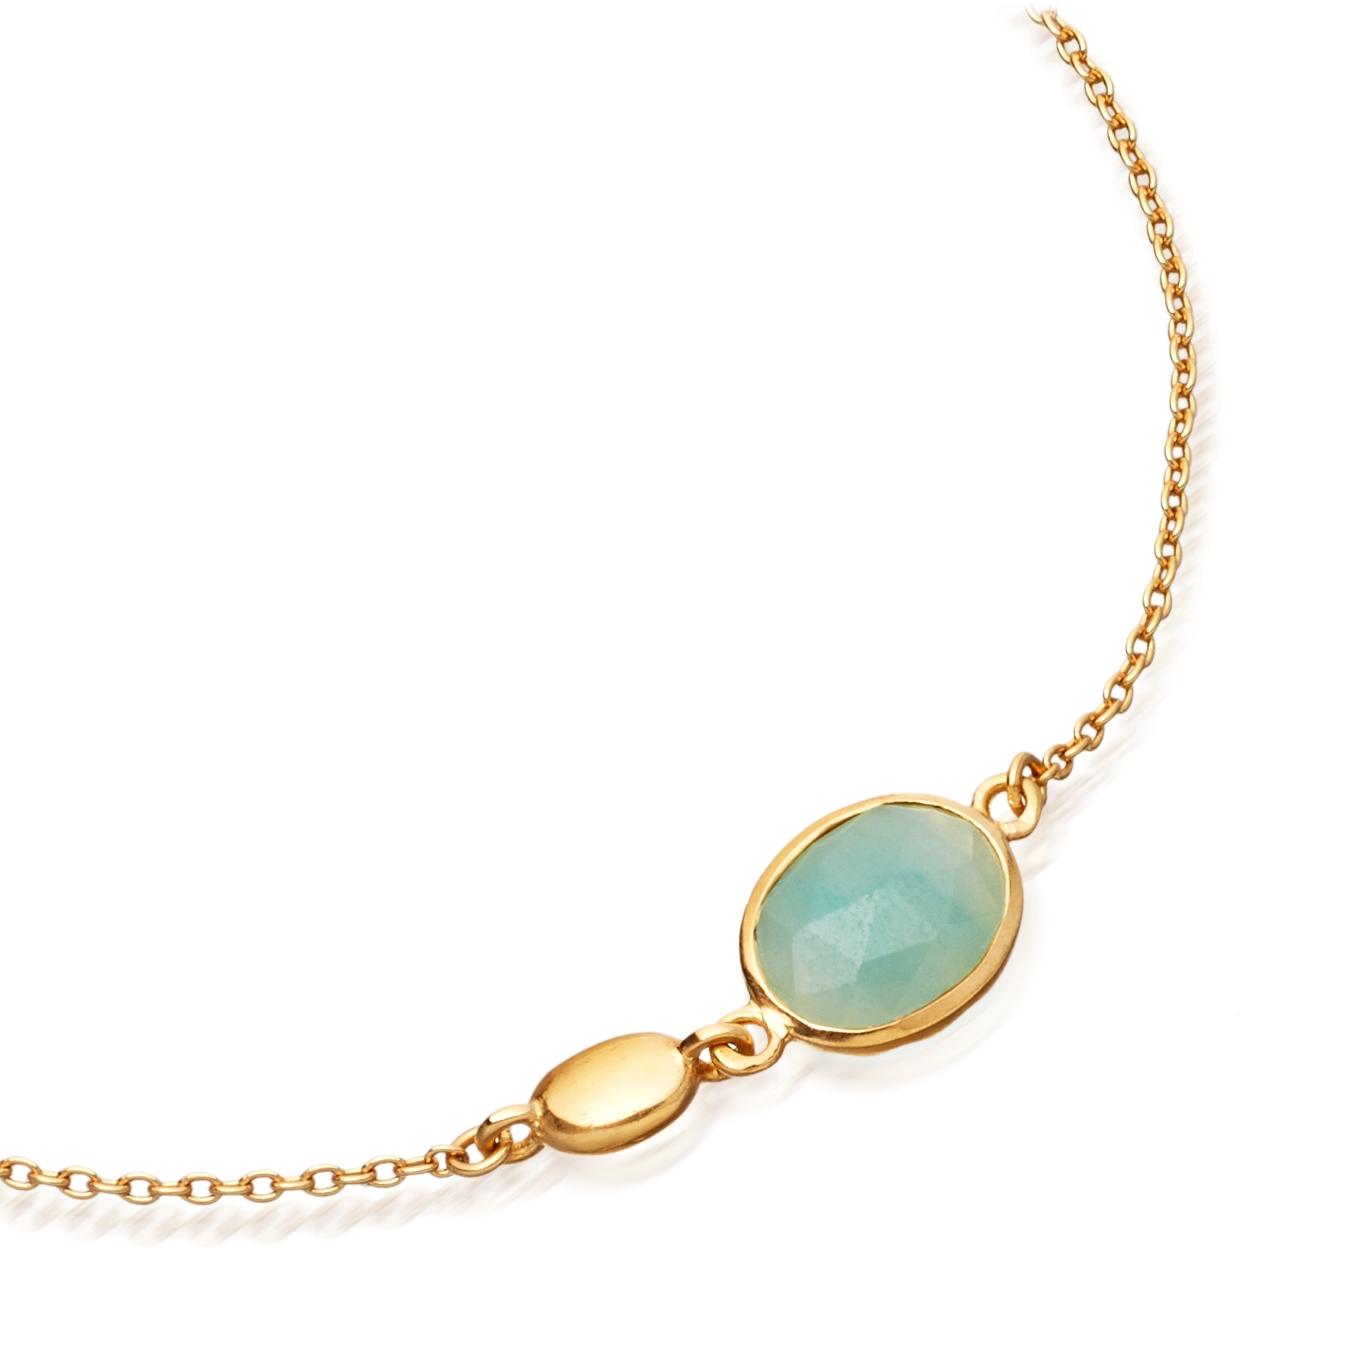 Milky Aqua Oval Stilla Bracelet